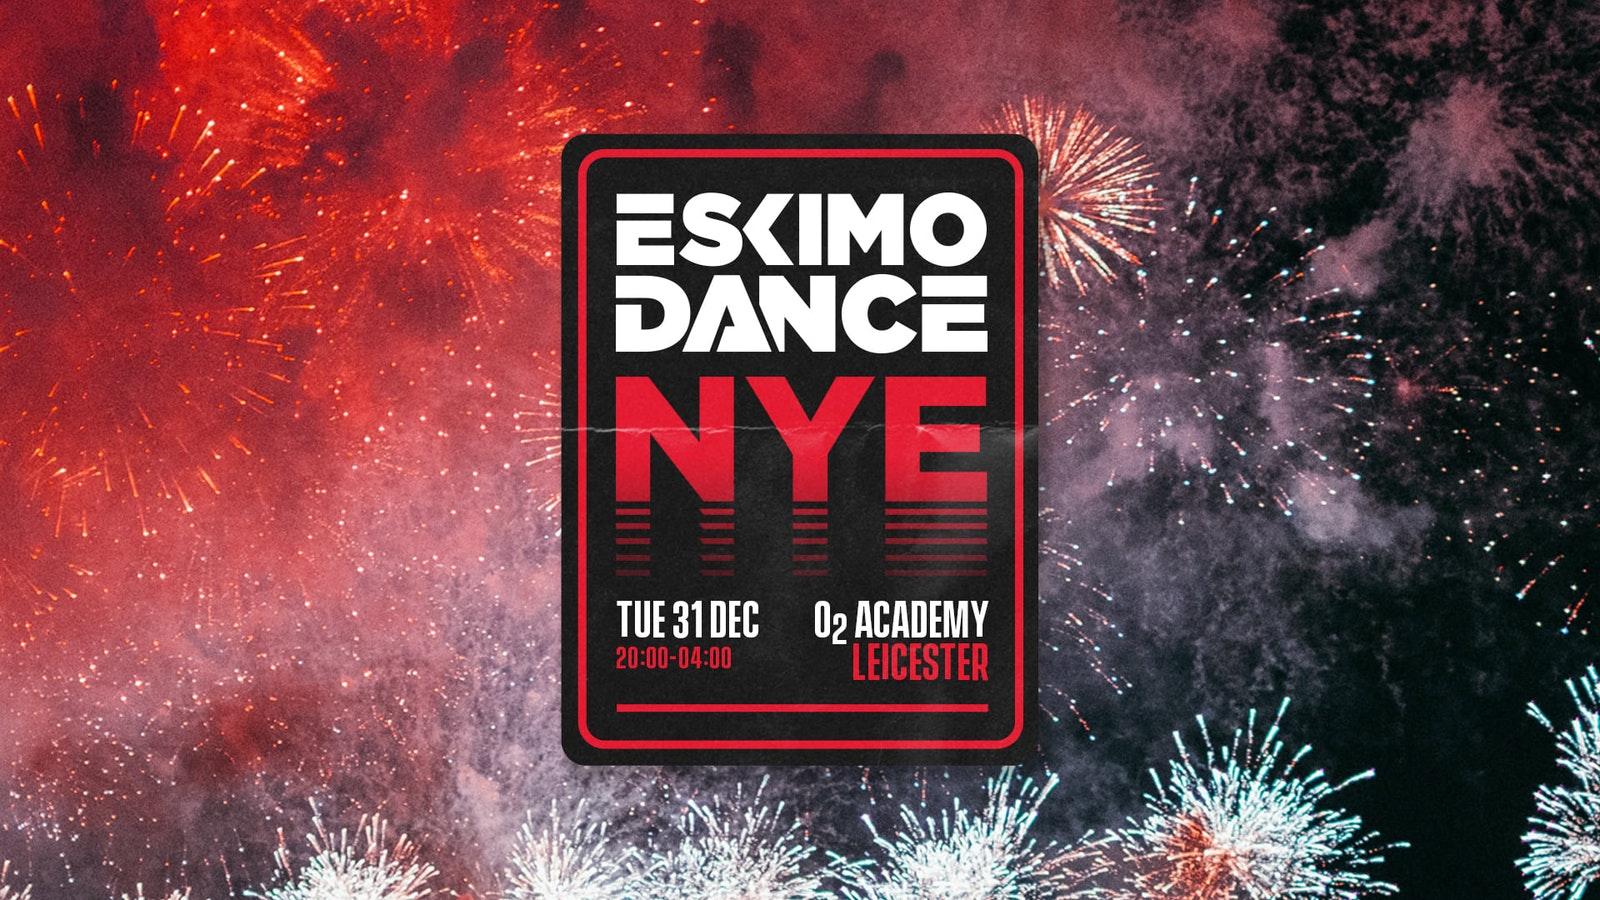 Eskimo Dance | New Years Eve 2019